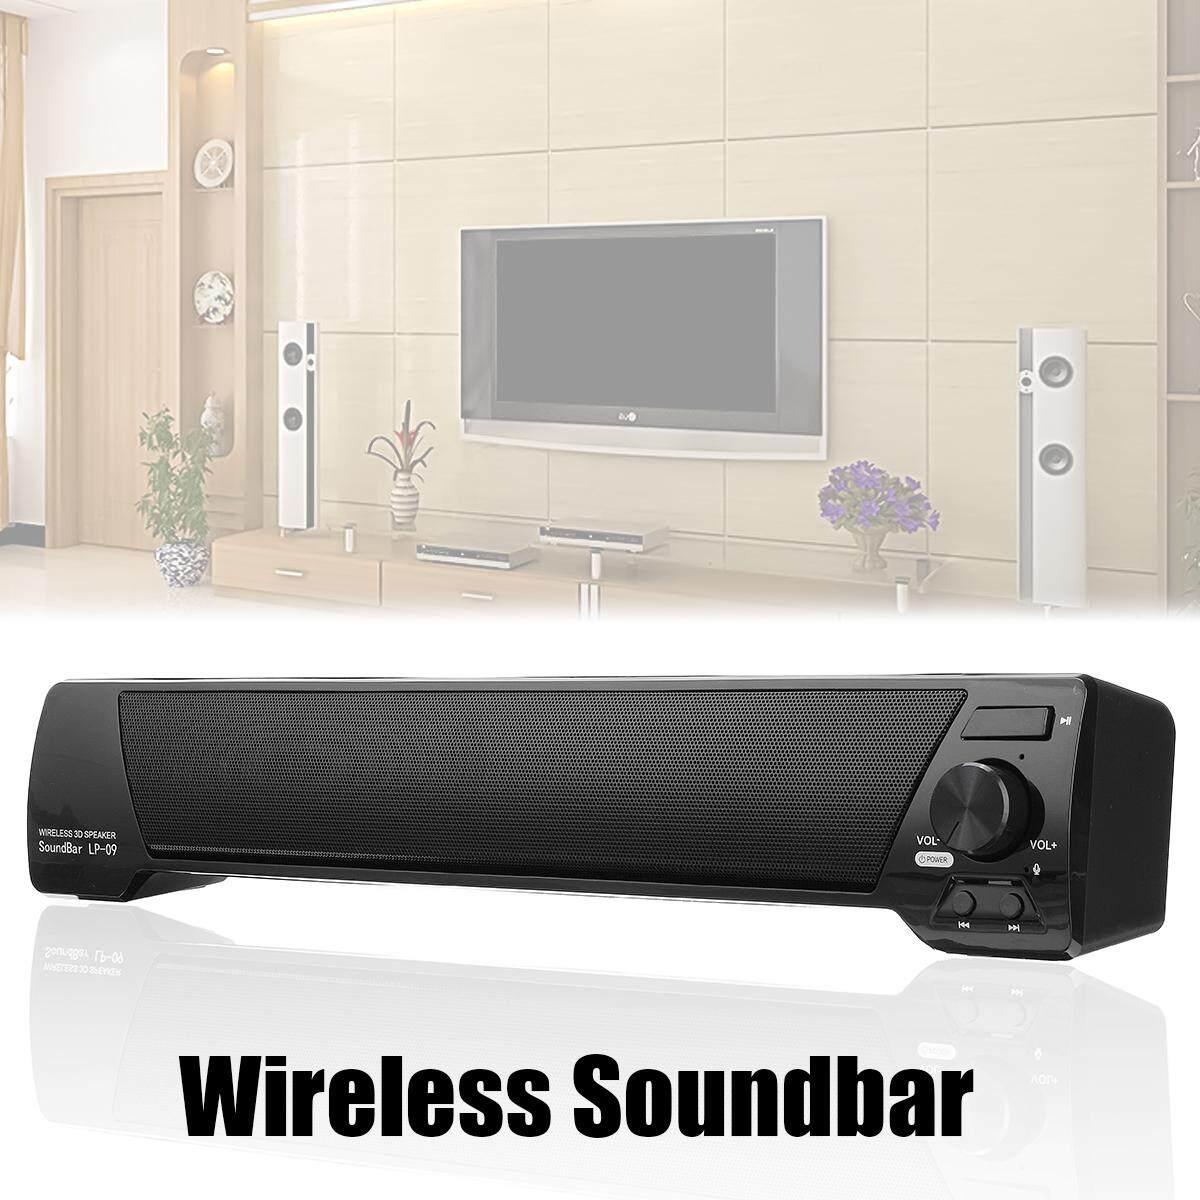 TV Sound Bar Home Theater Subwoofer Soundbar bluetooth Wireless AUX USB Speaker Black/White - intl